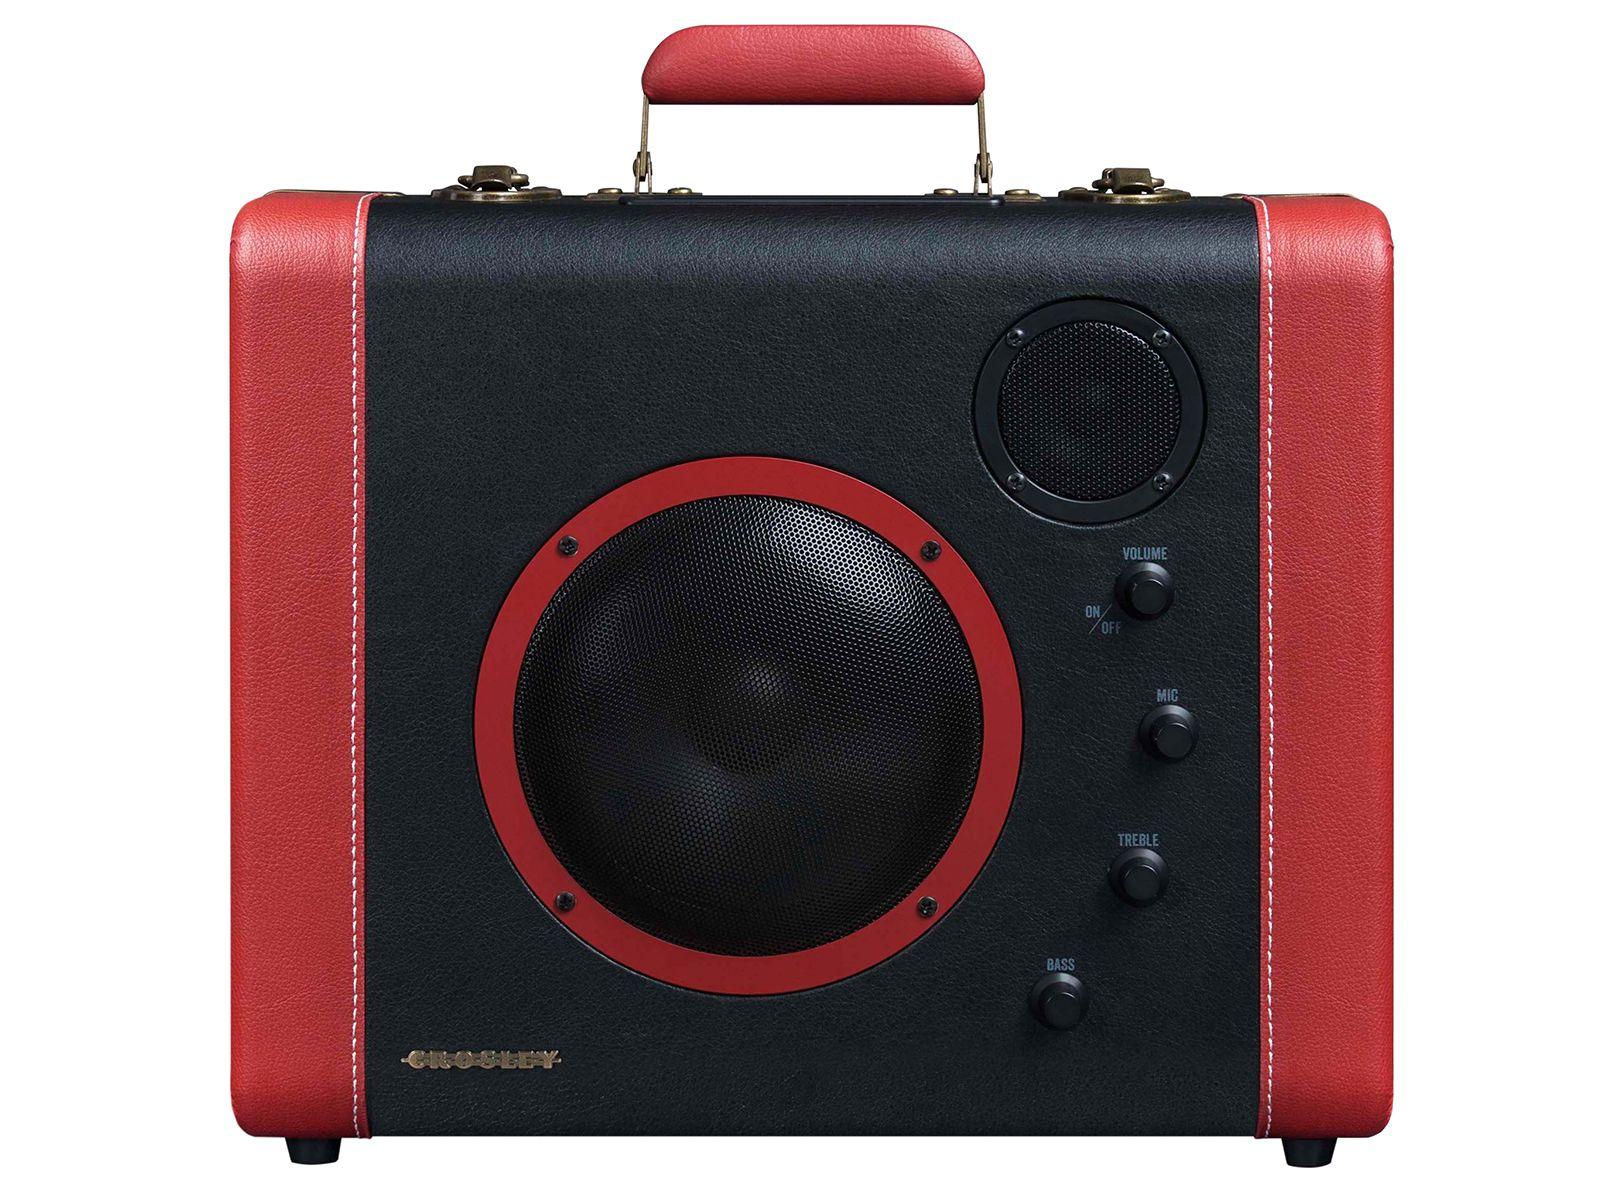 Soundbomb Bluetooth Speaker With Images Bluetooth Speakers Portable Portable Speaker System Portable Speaker